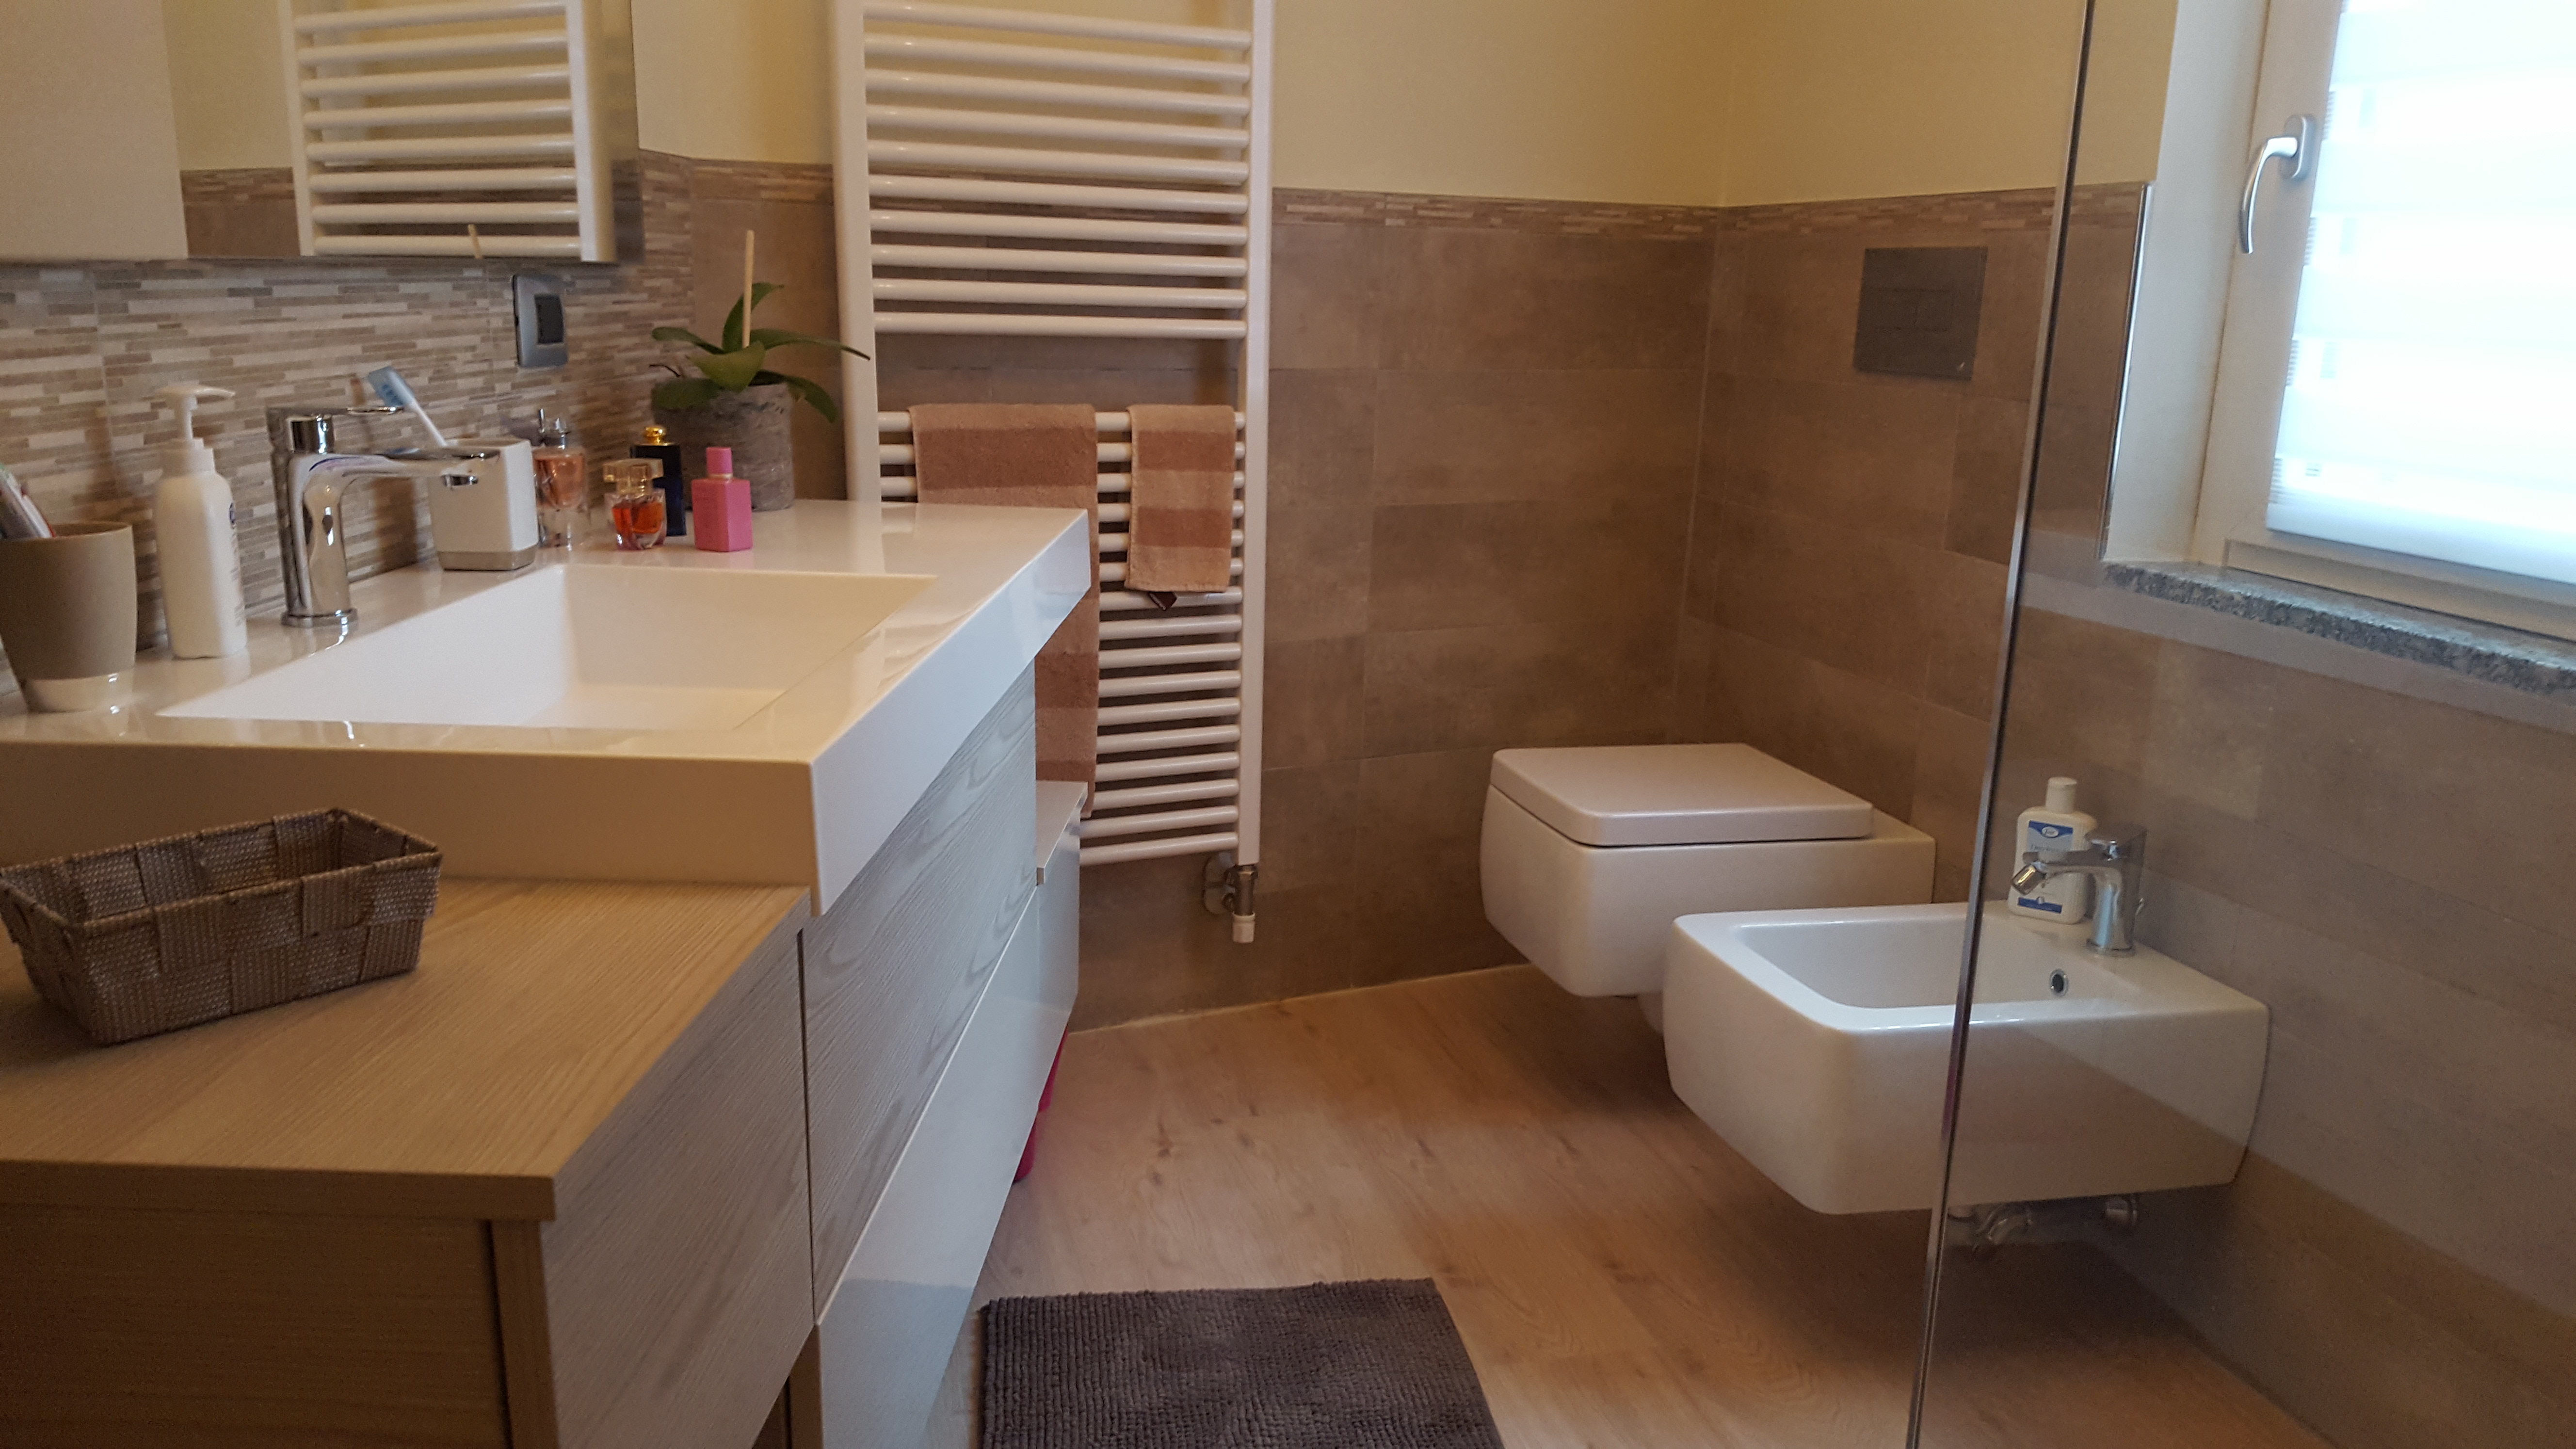 Vasca Da Bagno Kerasan : Vasca da bagno kerasan sanitari bagno nasce agua libre di